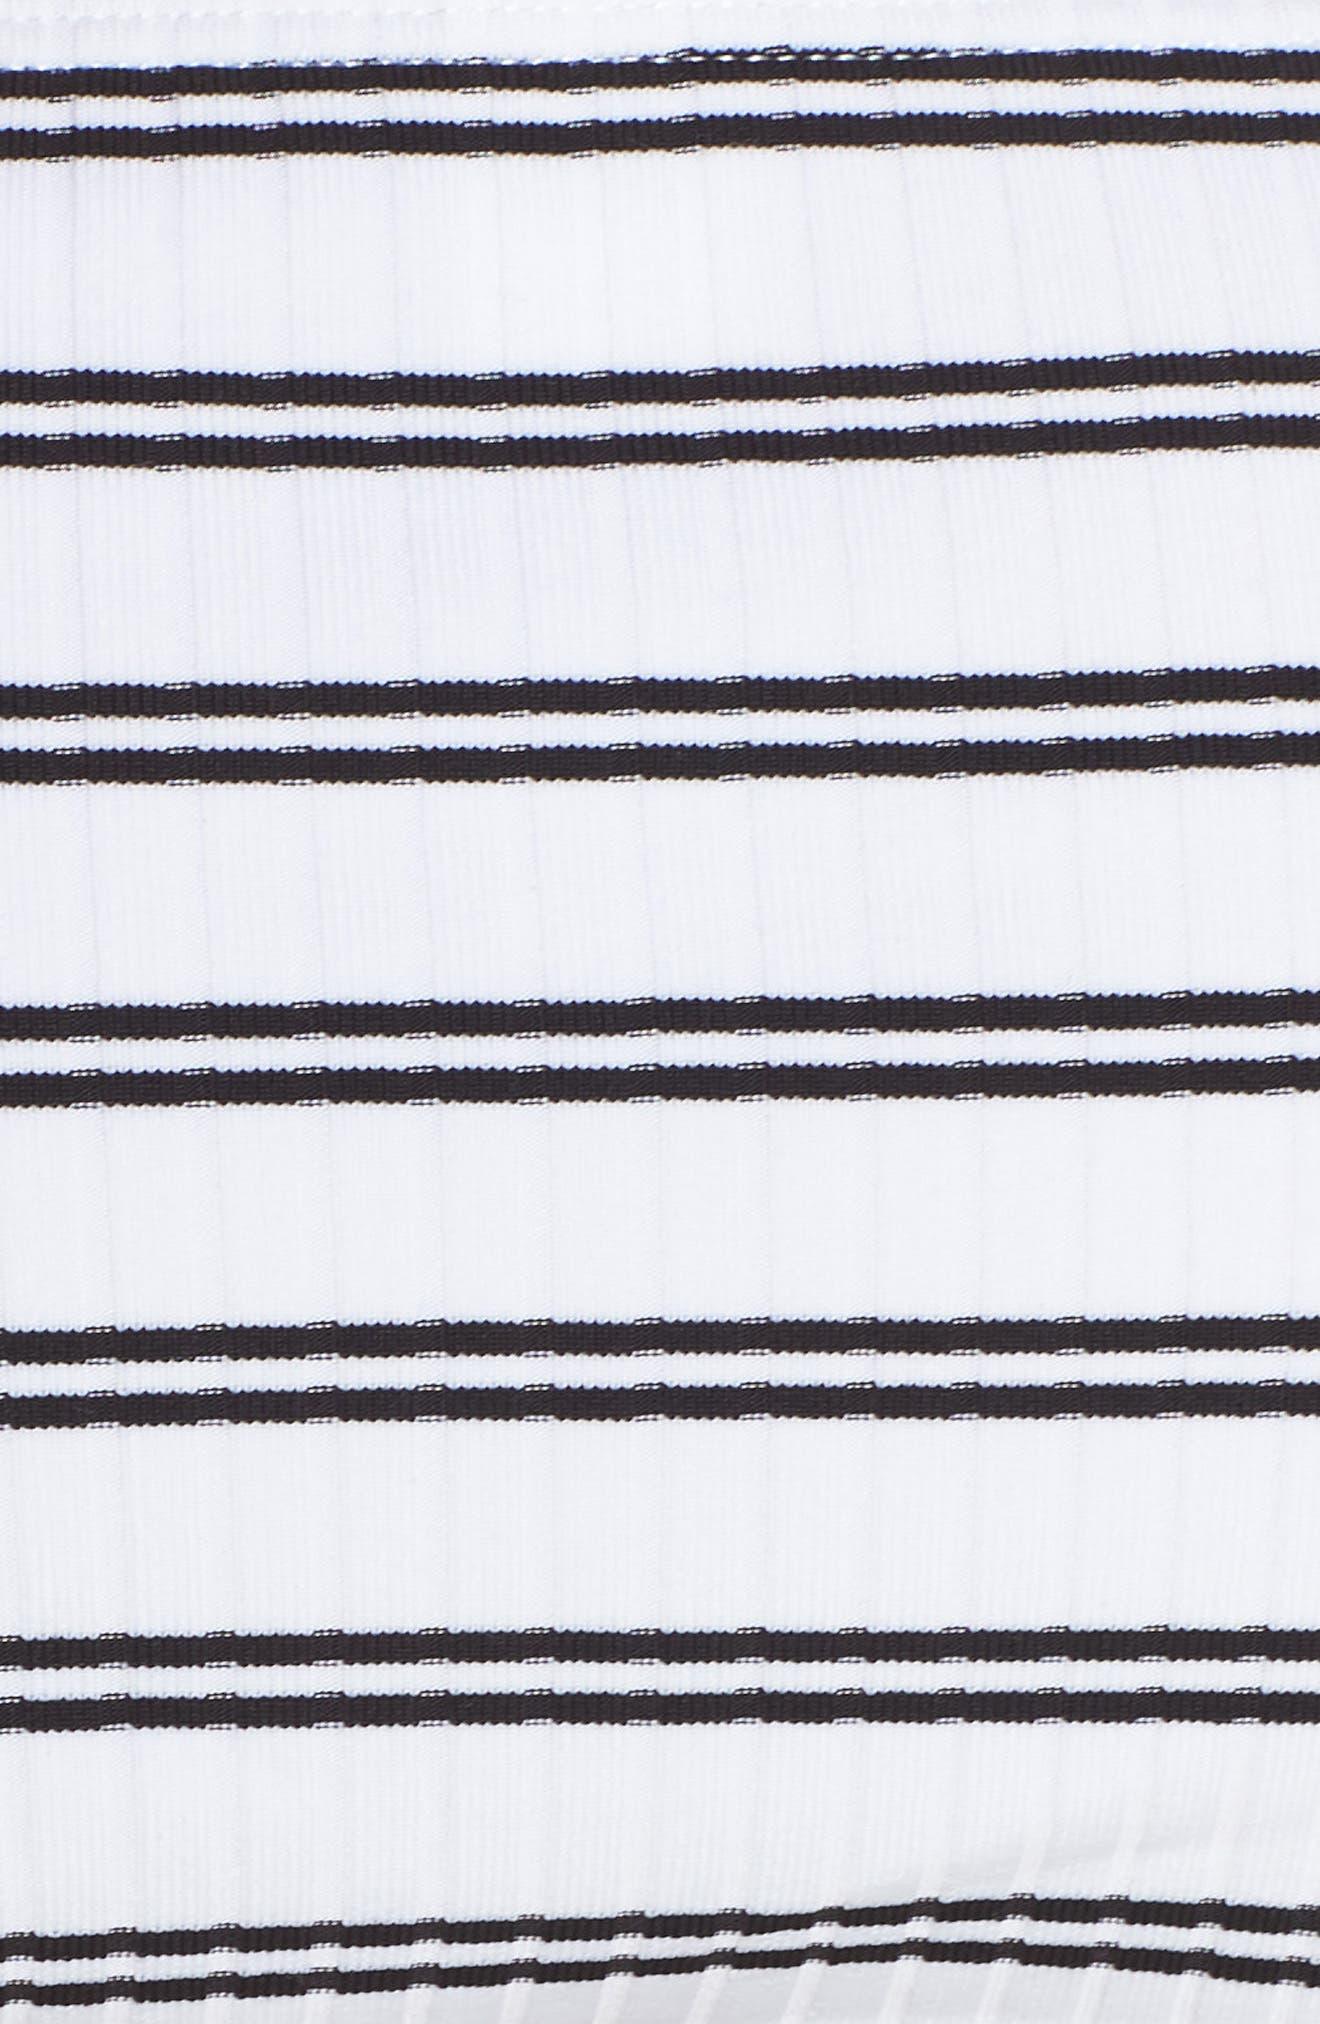 Inka Striped Hipster Bikini Bottoms,                             Alternate thumbnail 8, color,                             White